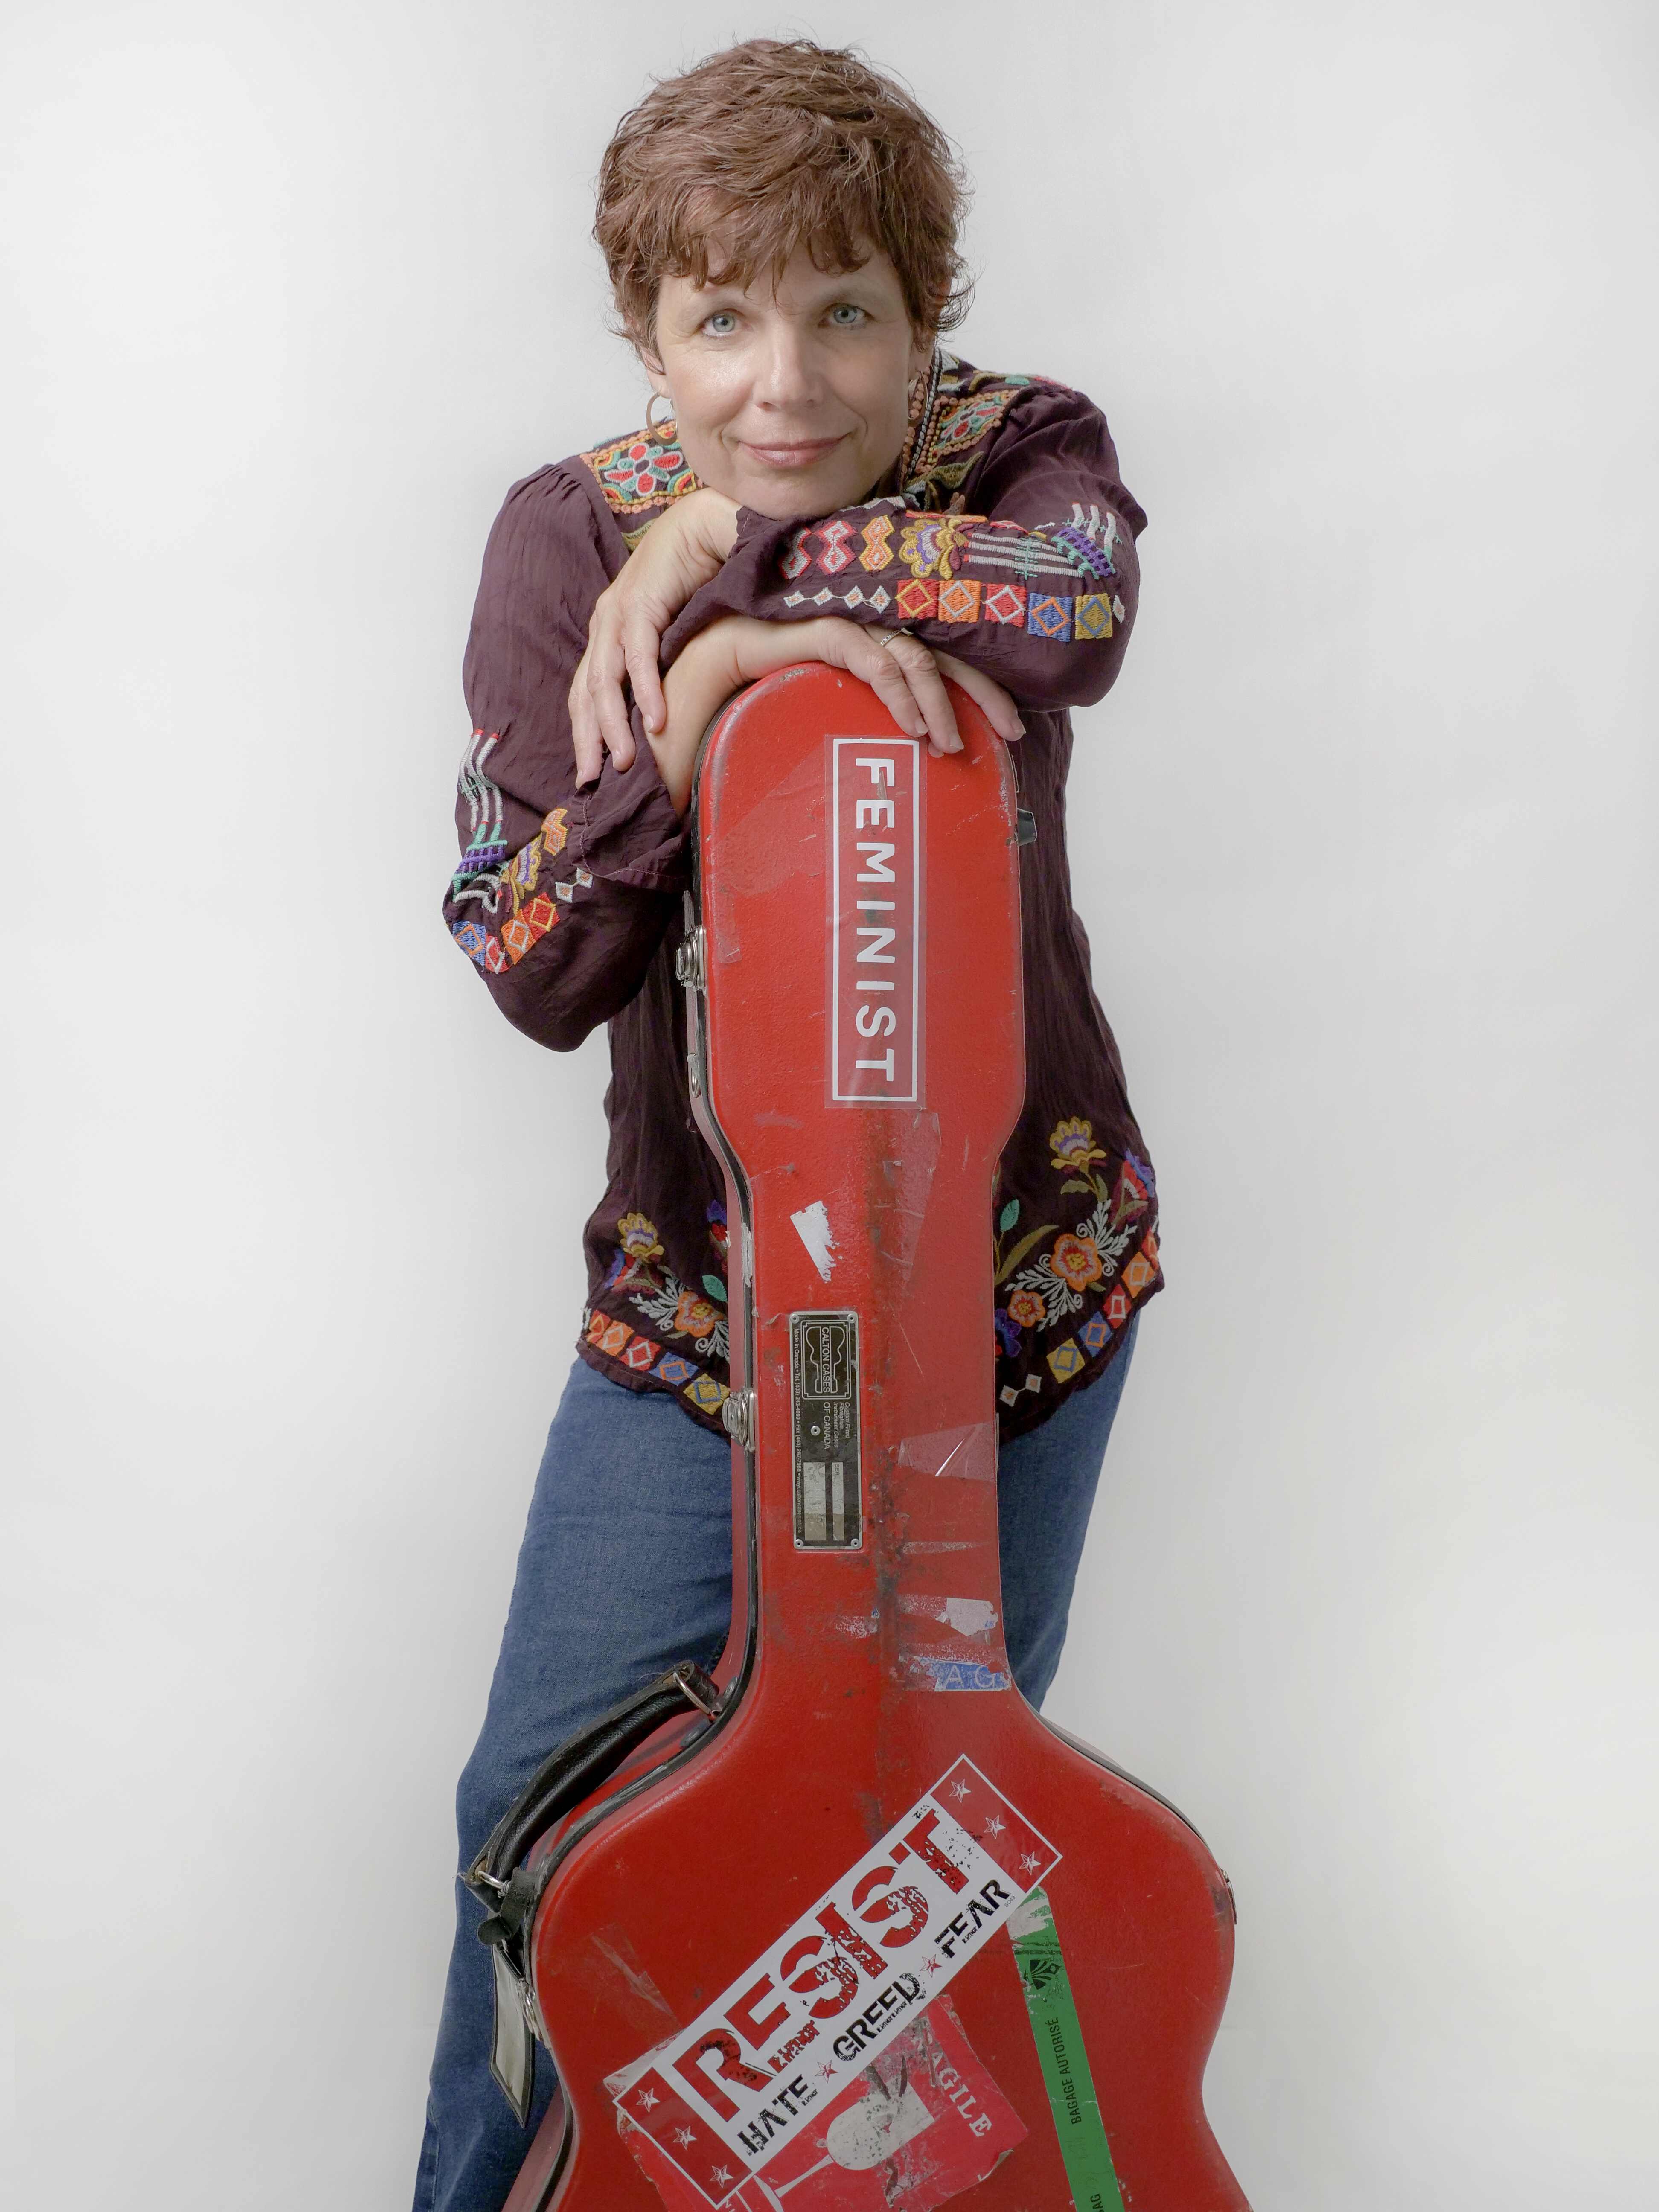 Jennifer Berezan, Canada/California